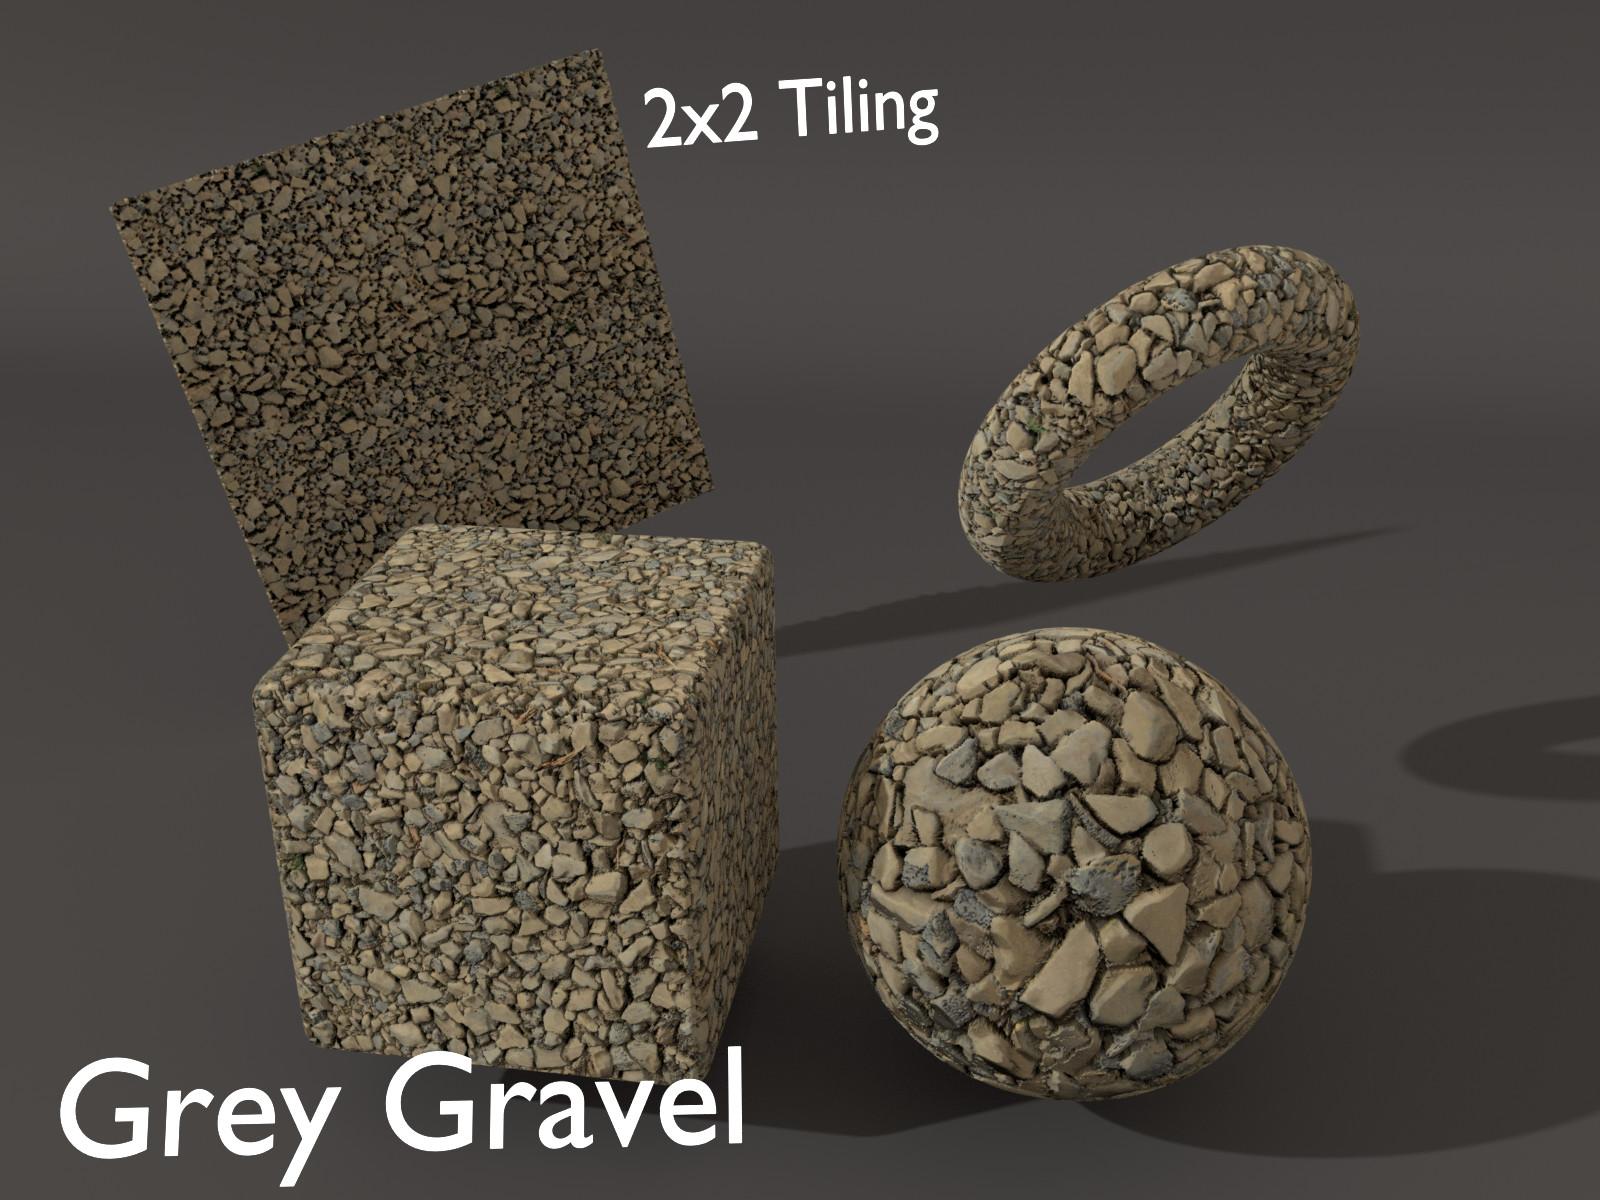 Sieben corgie greygravel p